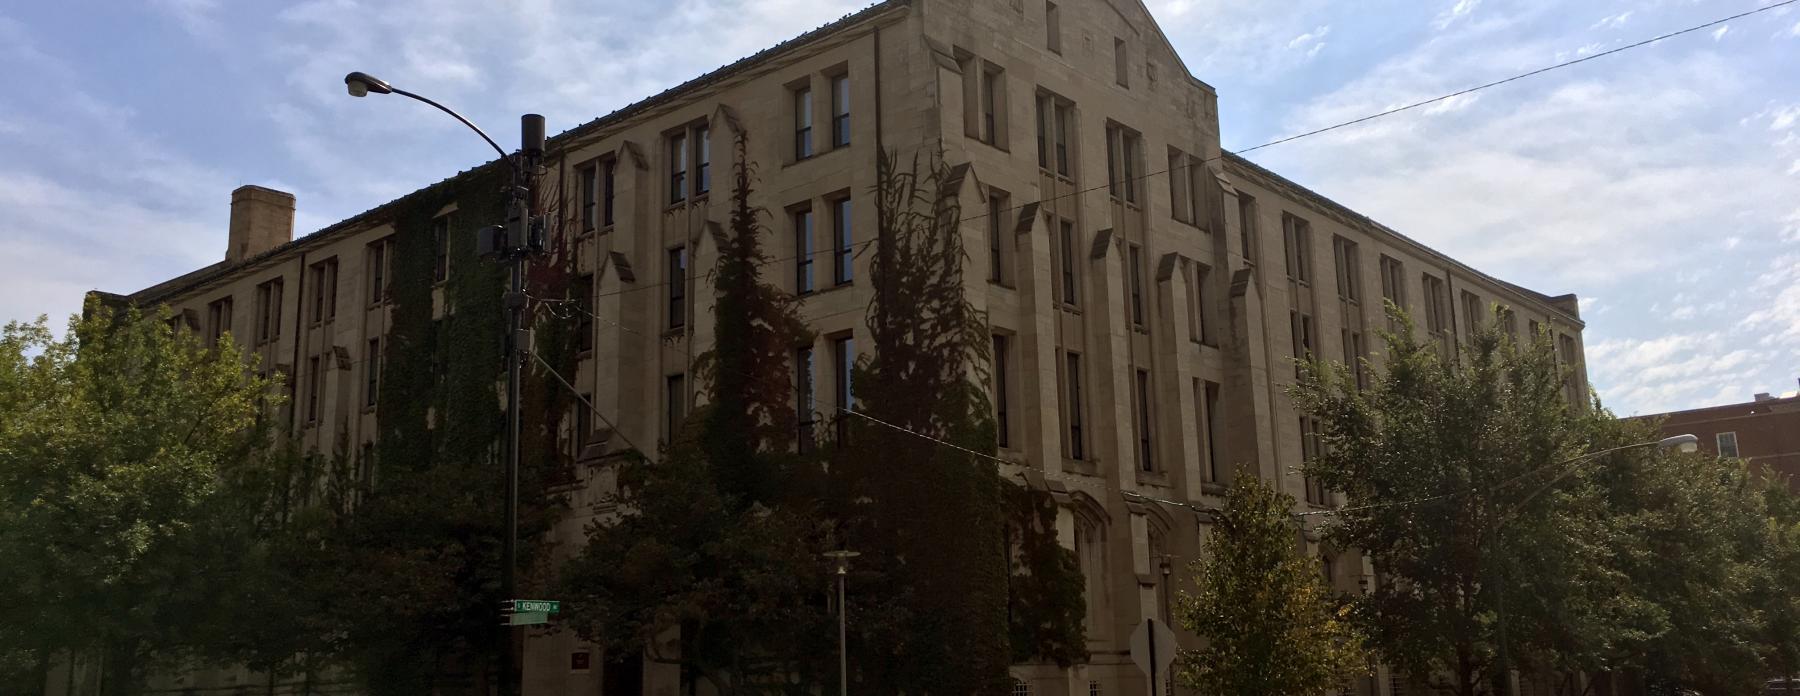 Chapin Hall exterior